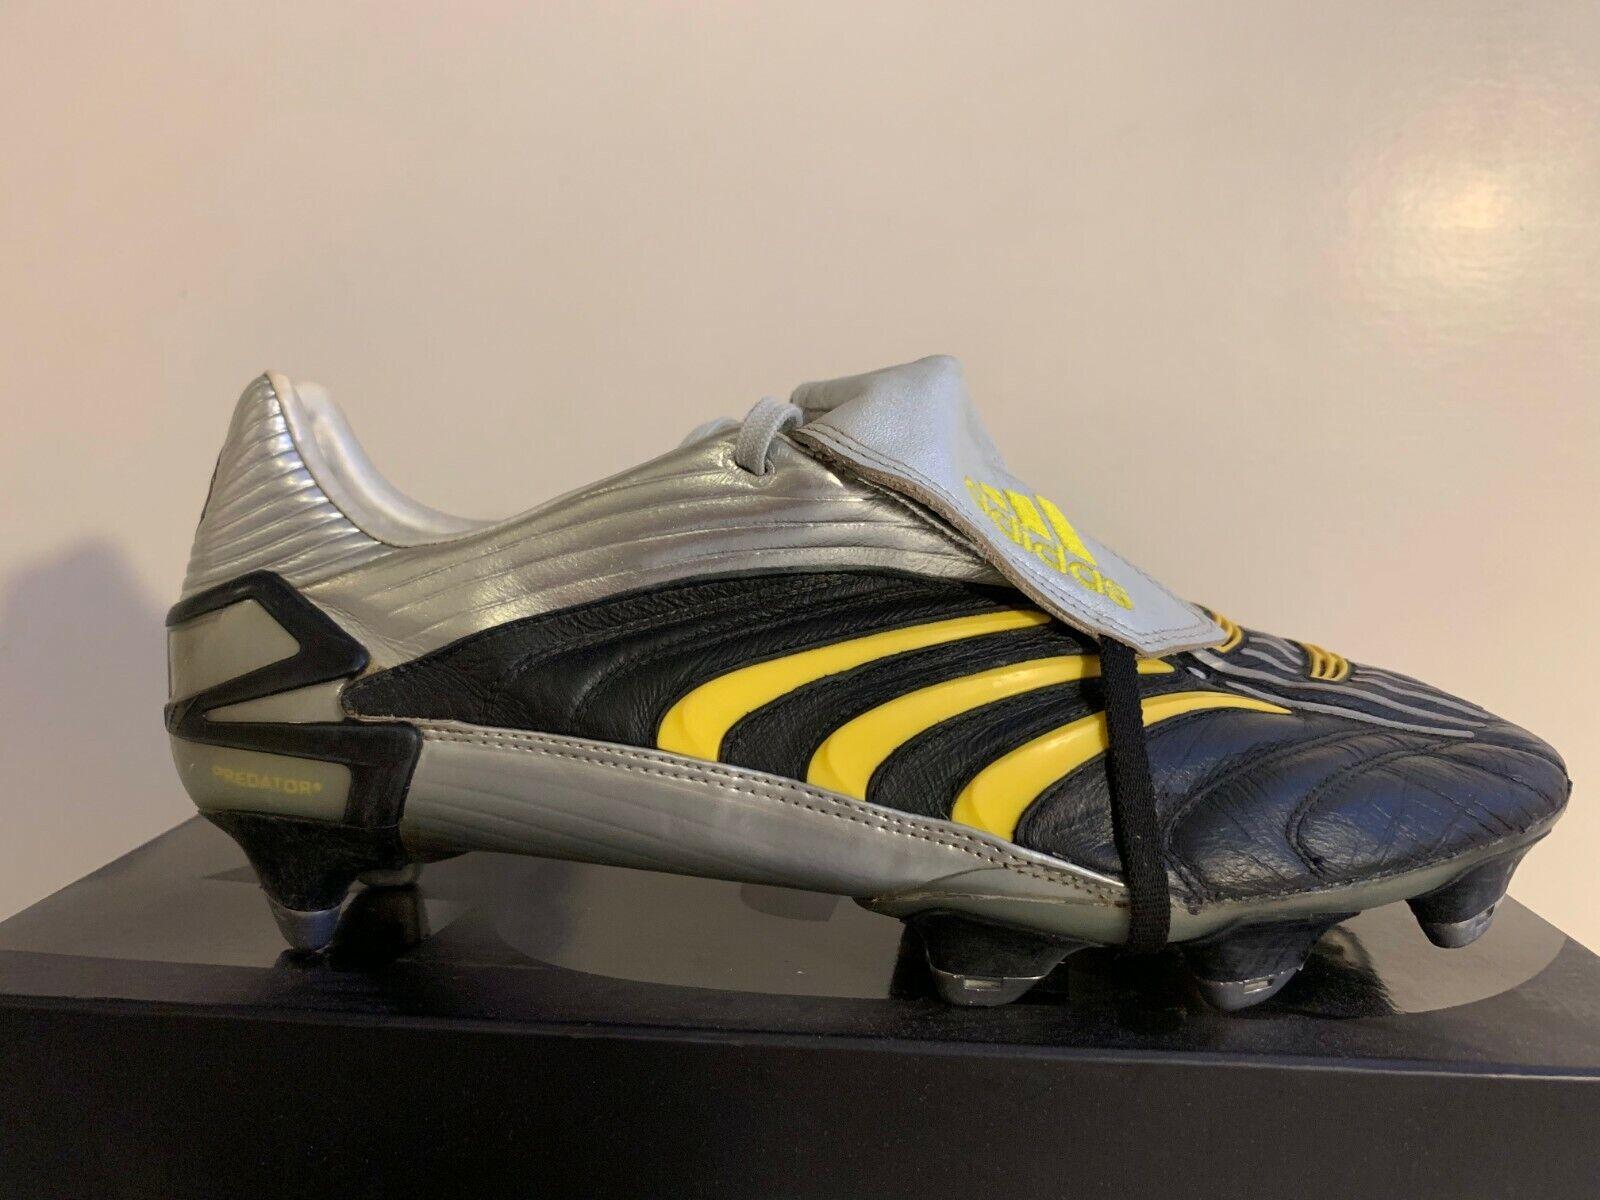 Adidas Pnetwerkator Powerswerve puls Soccer Cleats Grootte 11,5 11 46